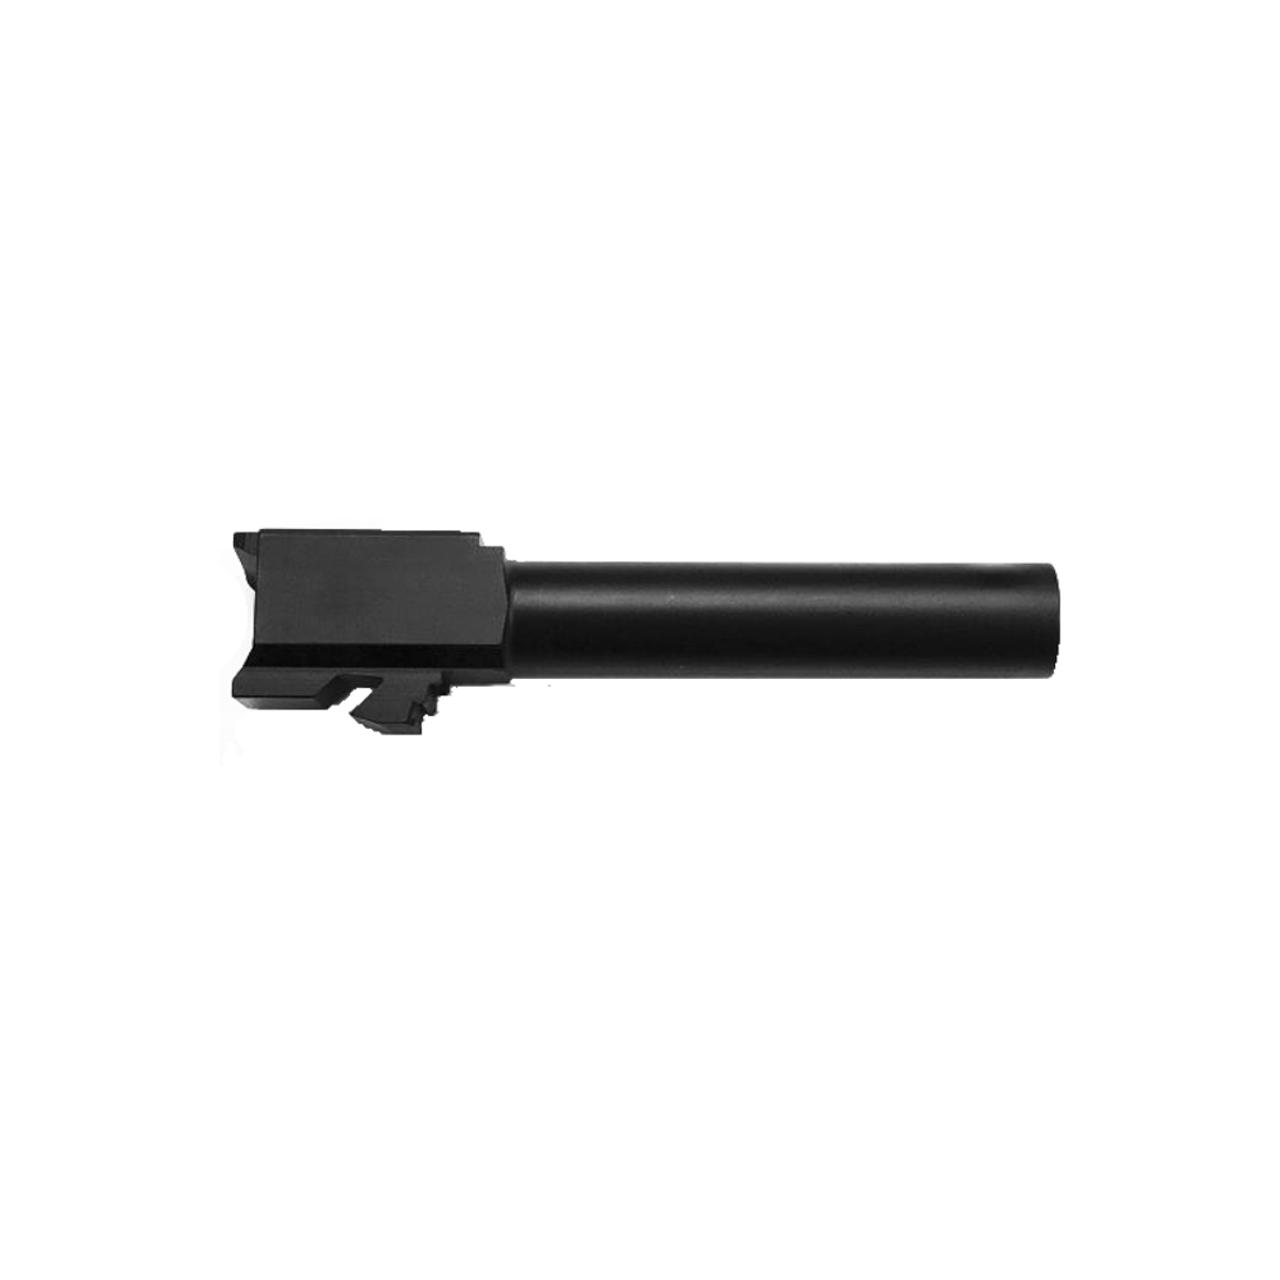 Black Nitride Drop In Glock 19 Barrel